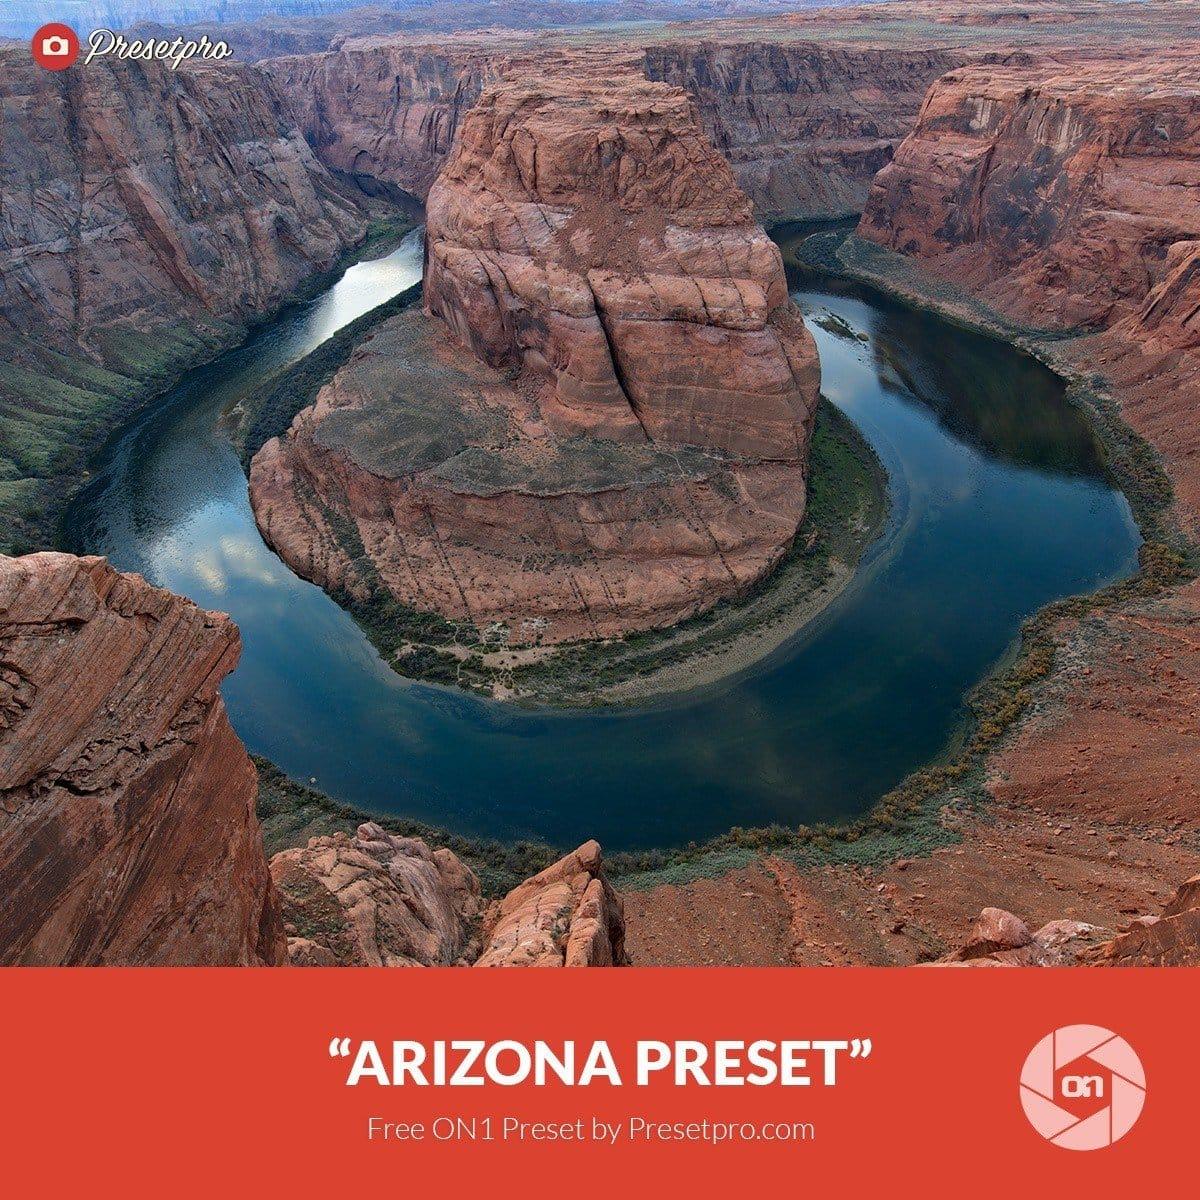 Free-On1-Preset-Arizona-Presetpro.com